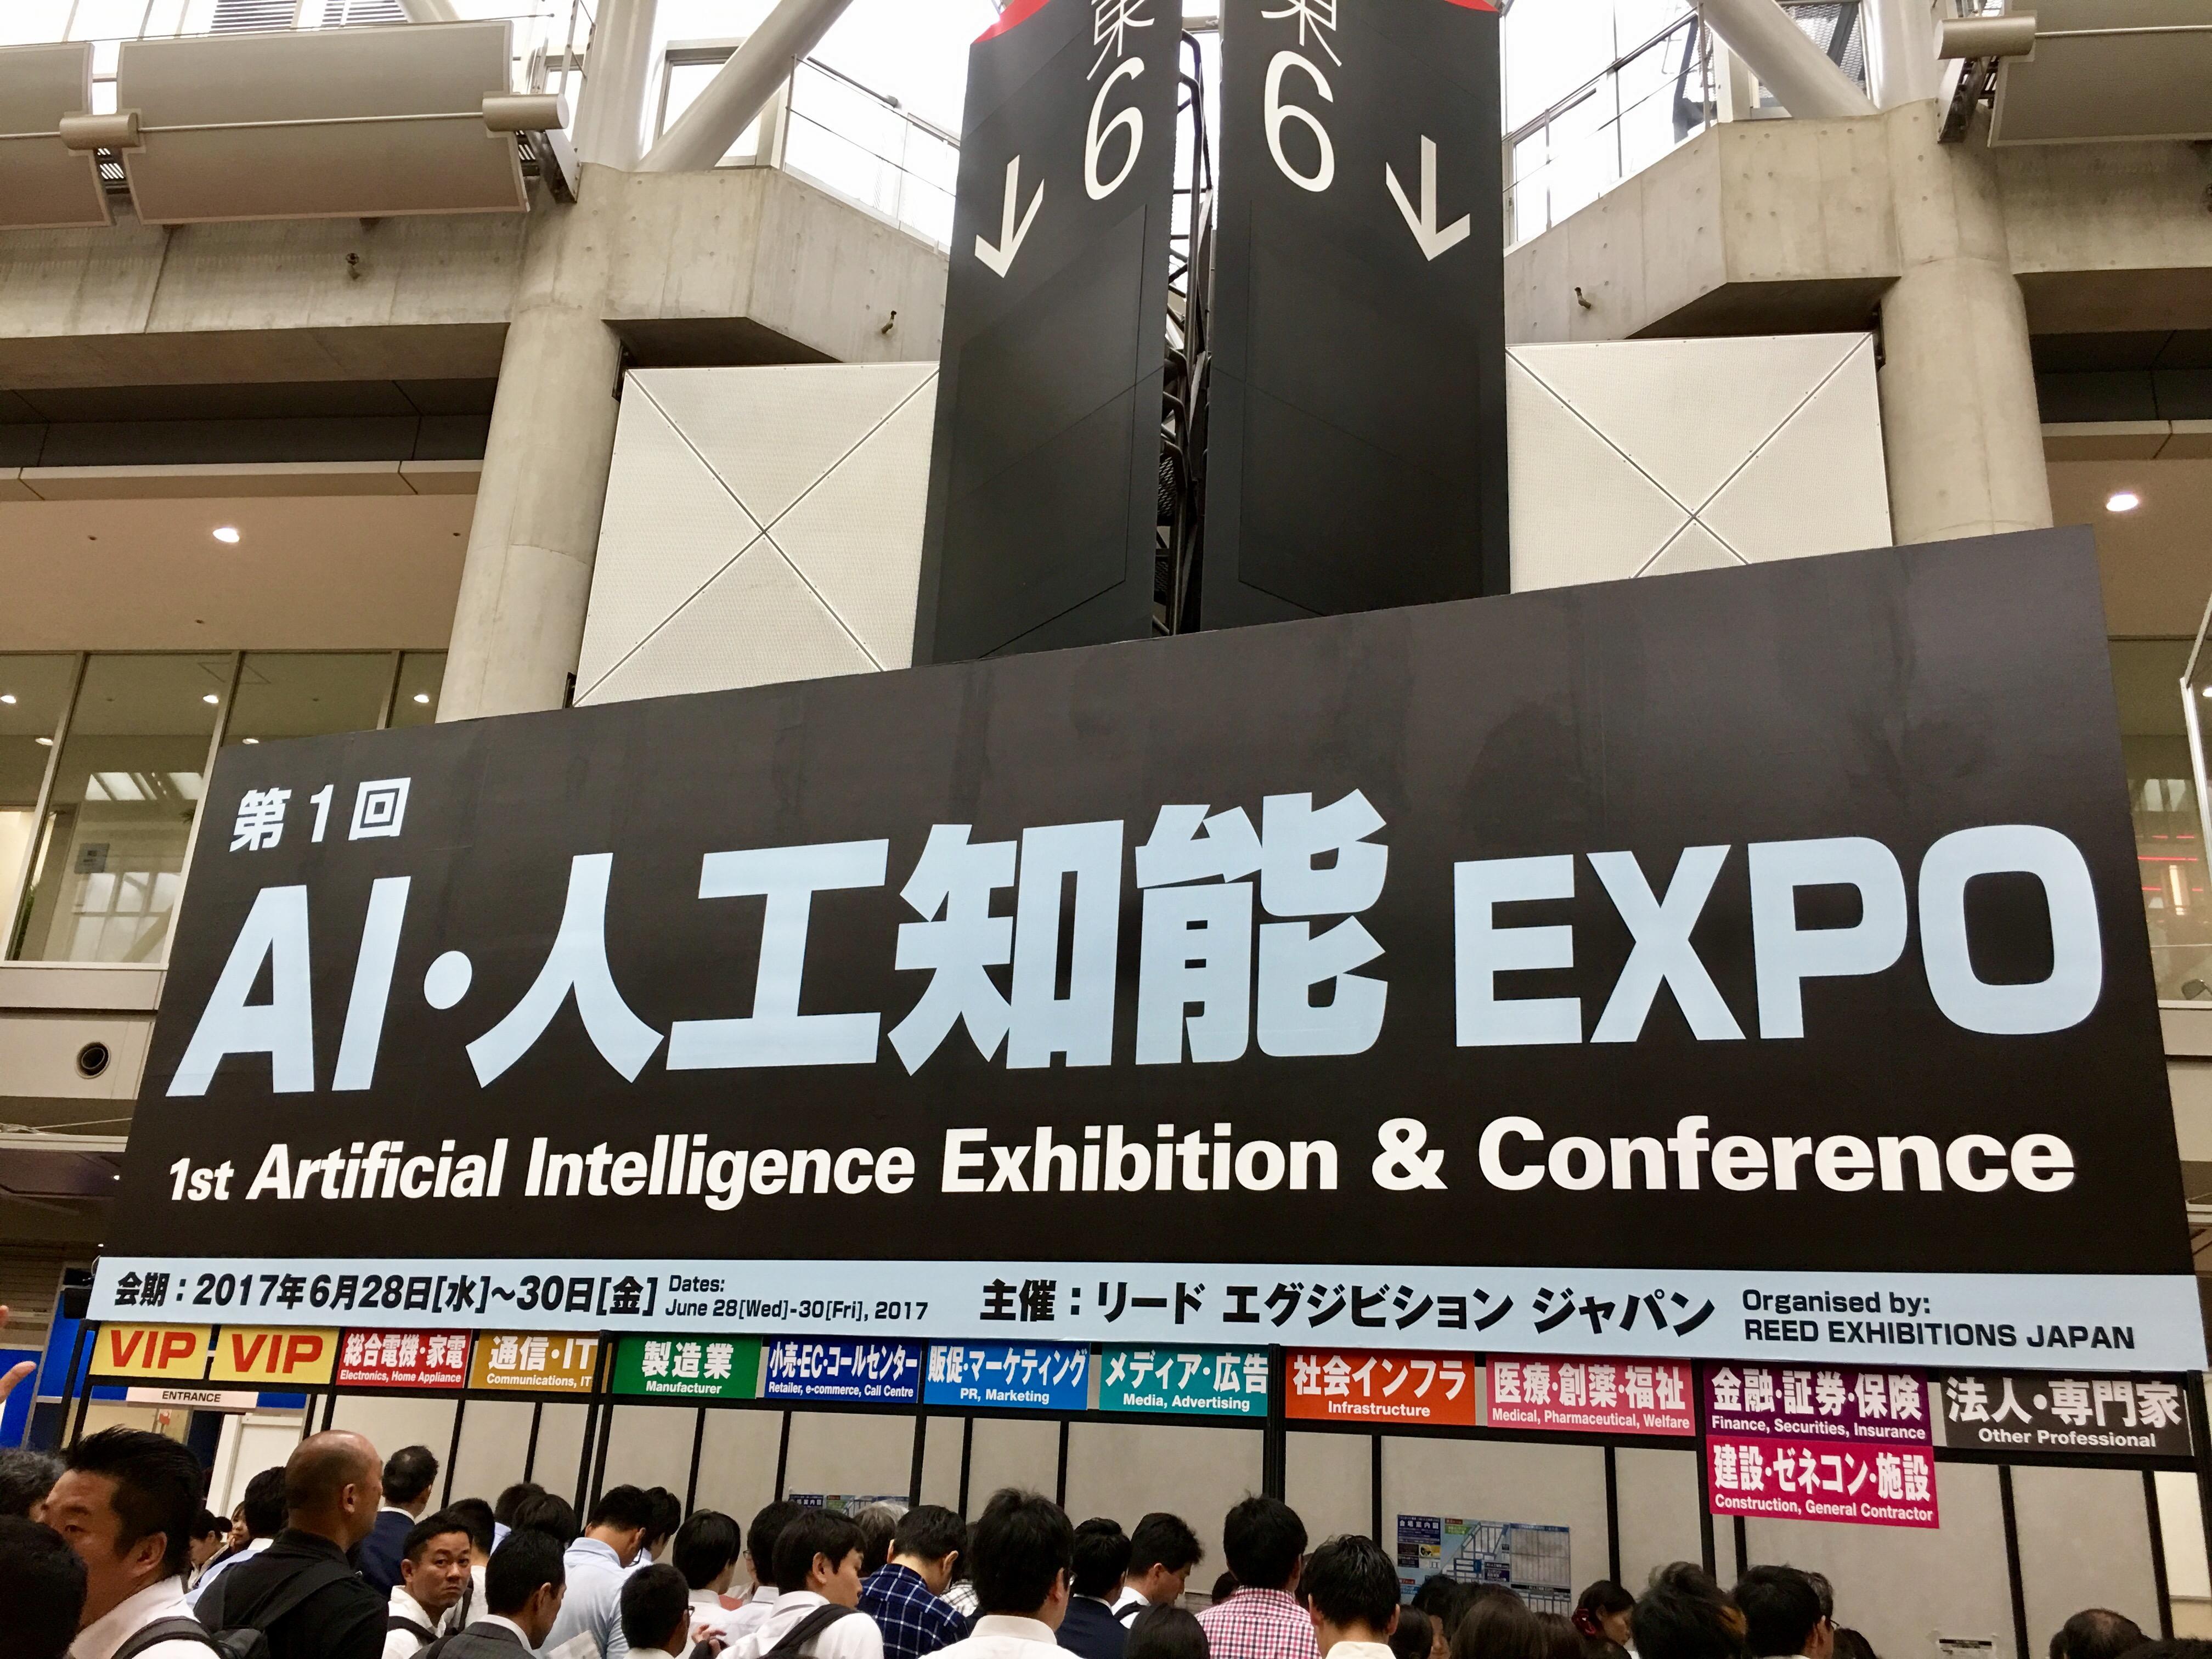 AI人工知能Expo イーレンジャー株式会社